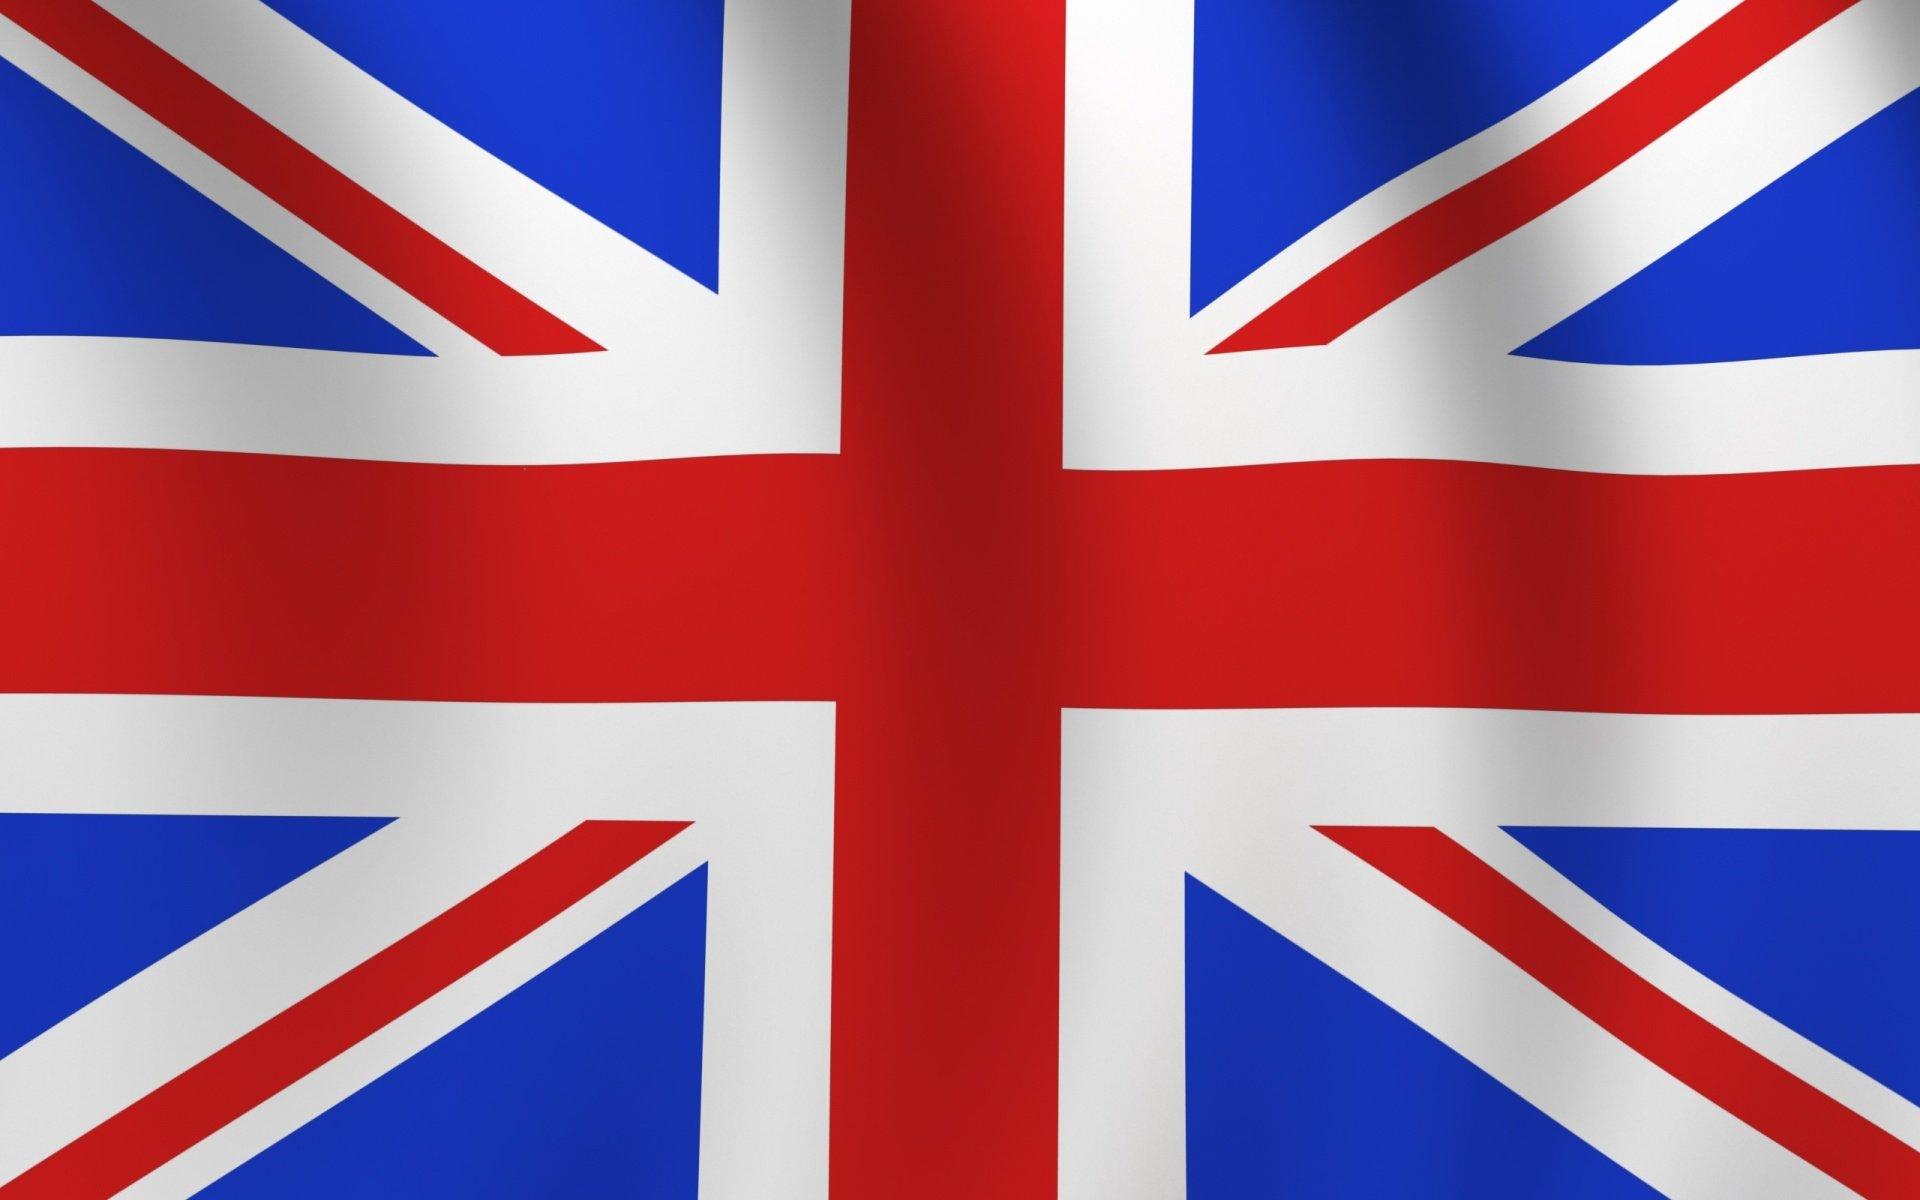 British Flag IPhone Wallpaper